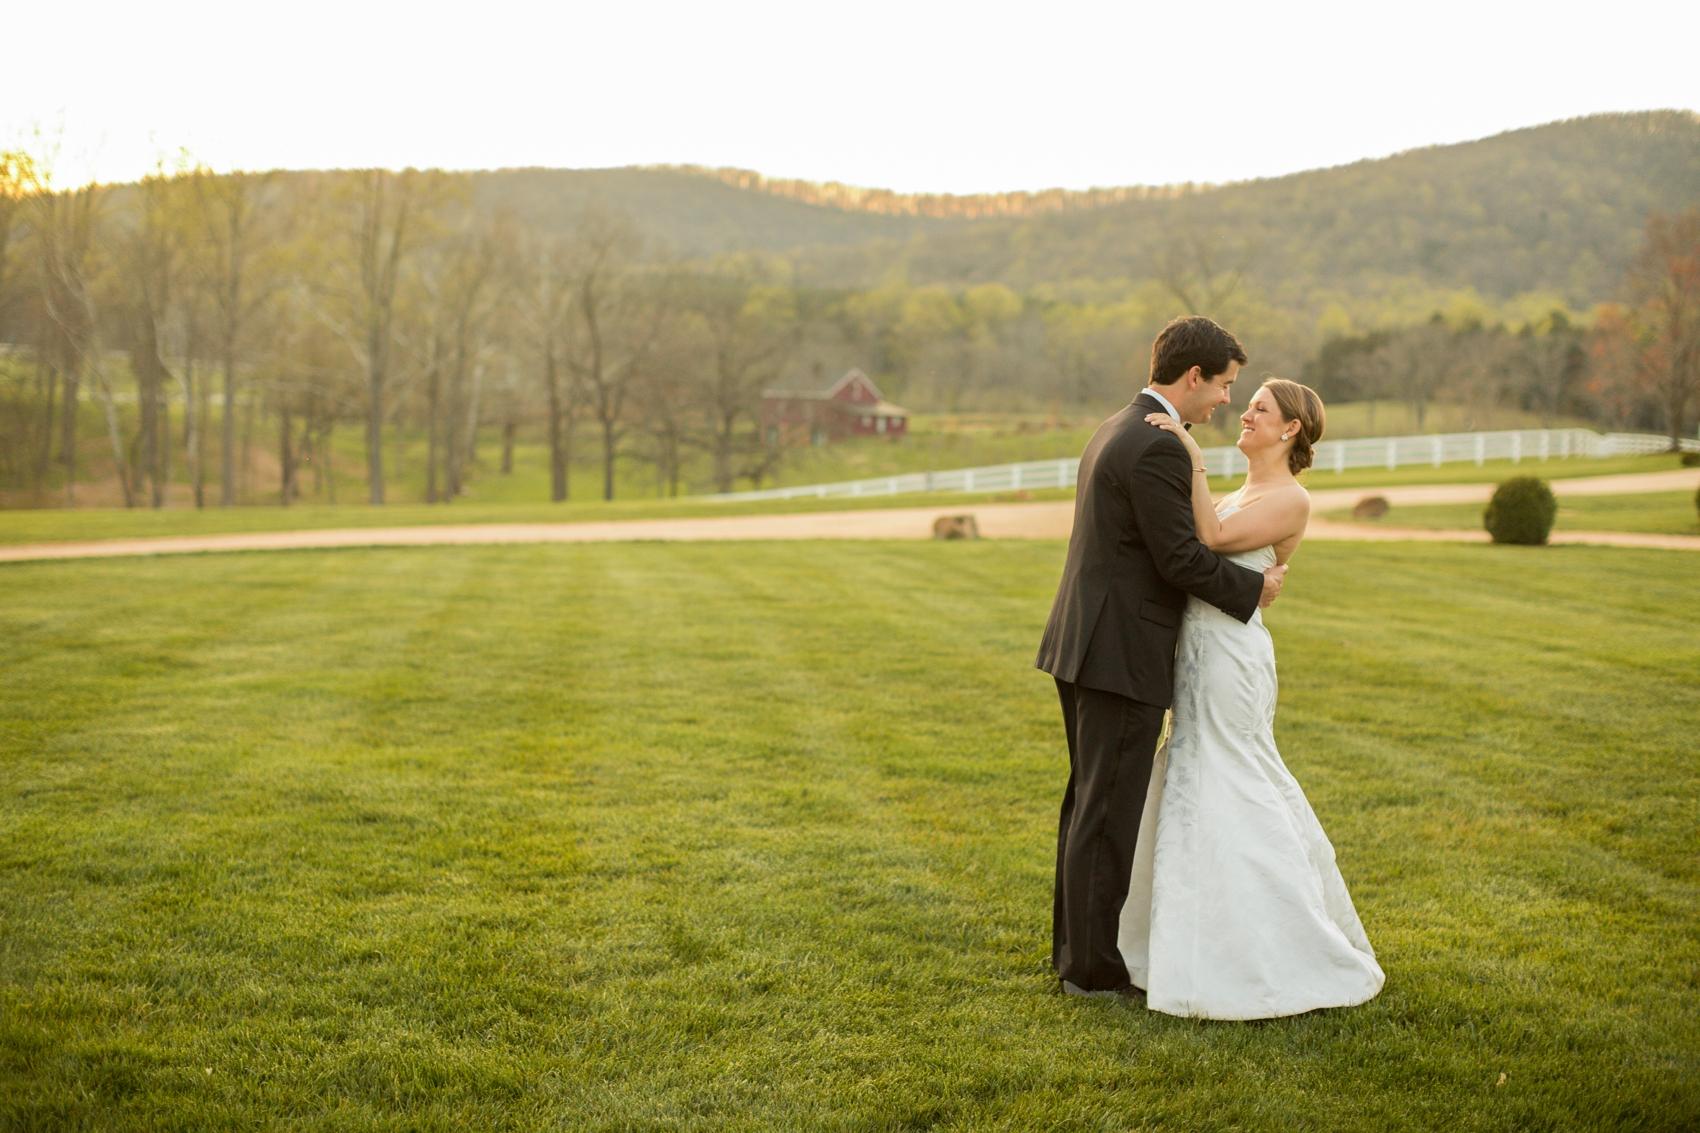 Castle-Hill-Virginia-Wedding-2019-0008.jpg